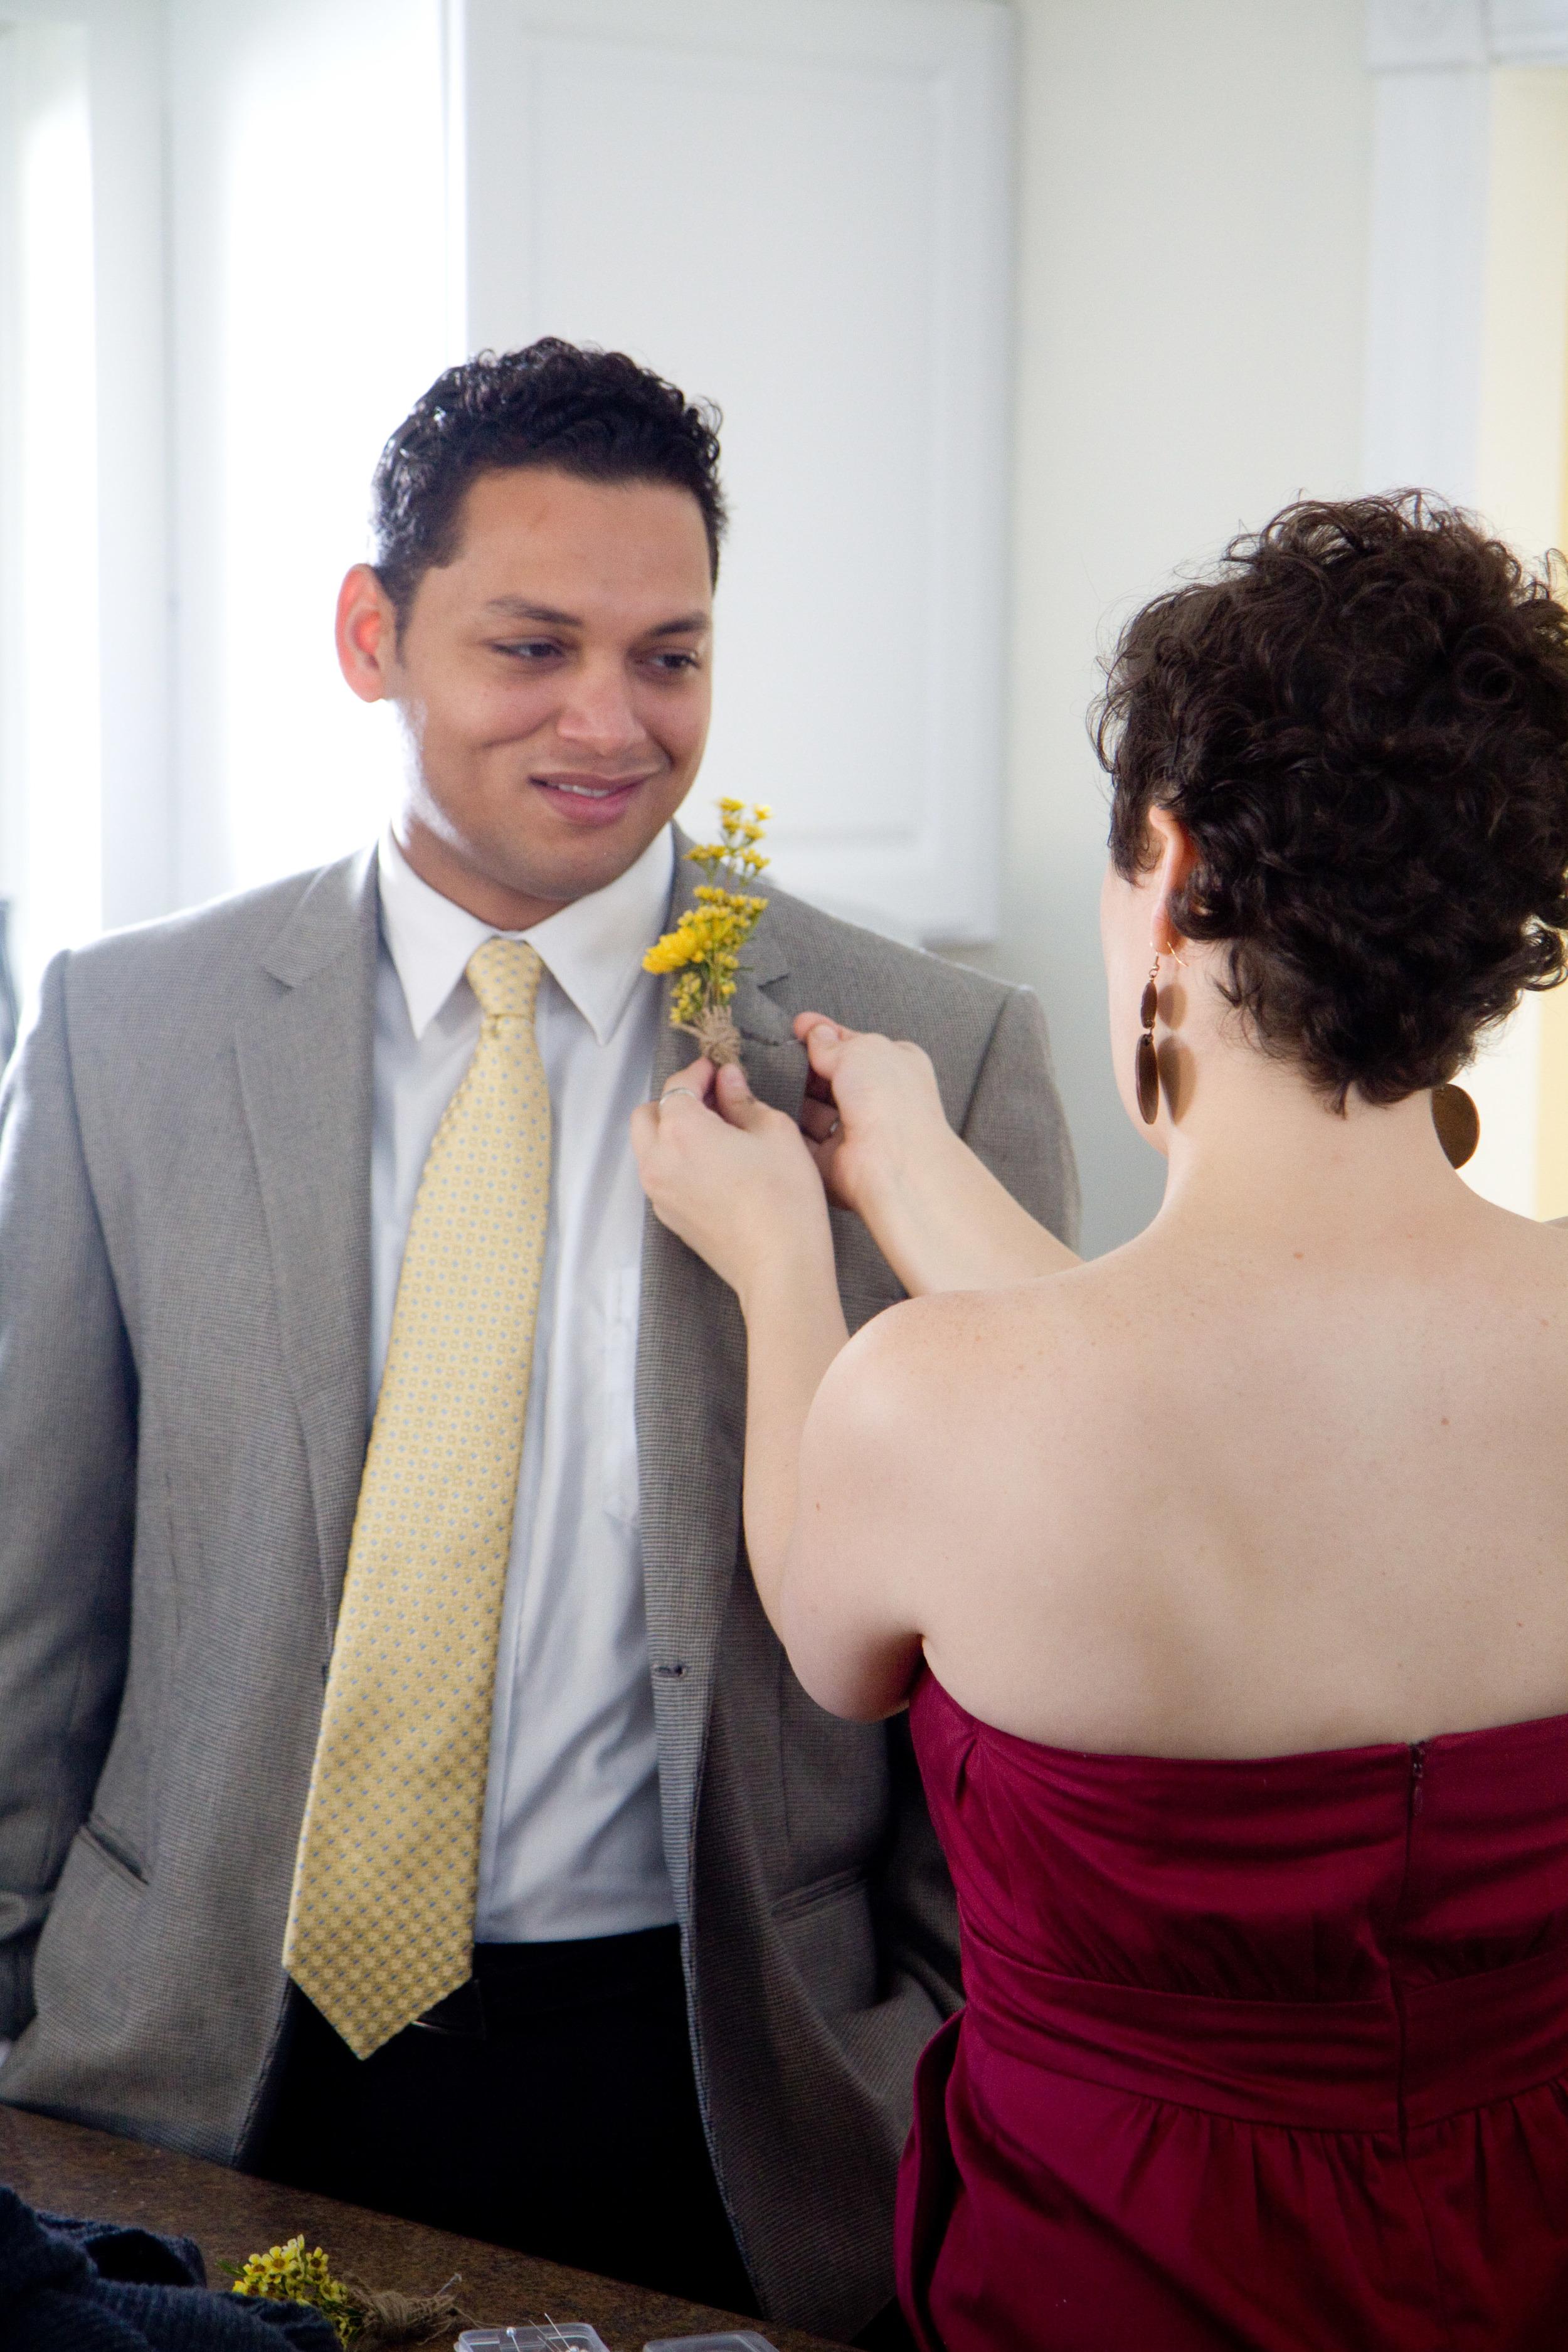 Wilson Bickel Wedding - Reception and Ceremony (42 of 526).jpg